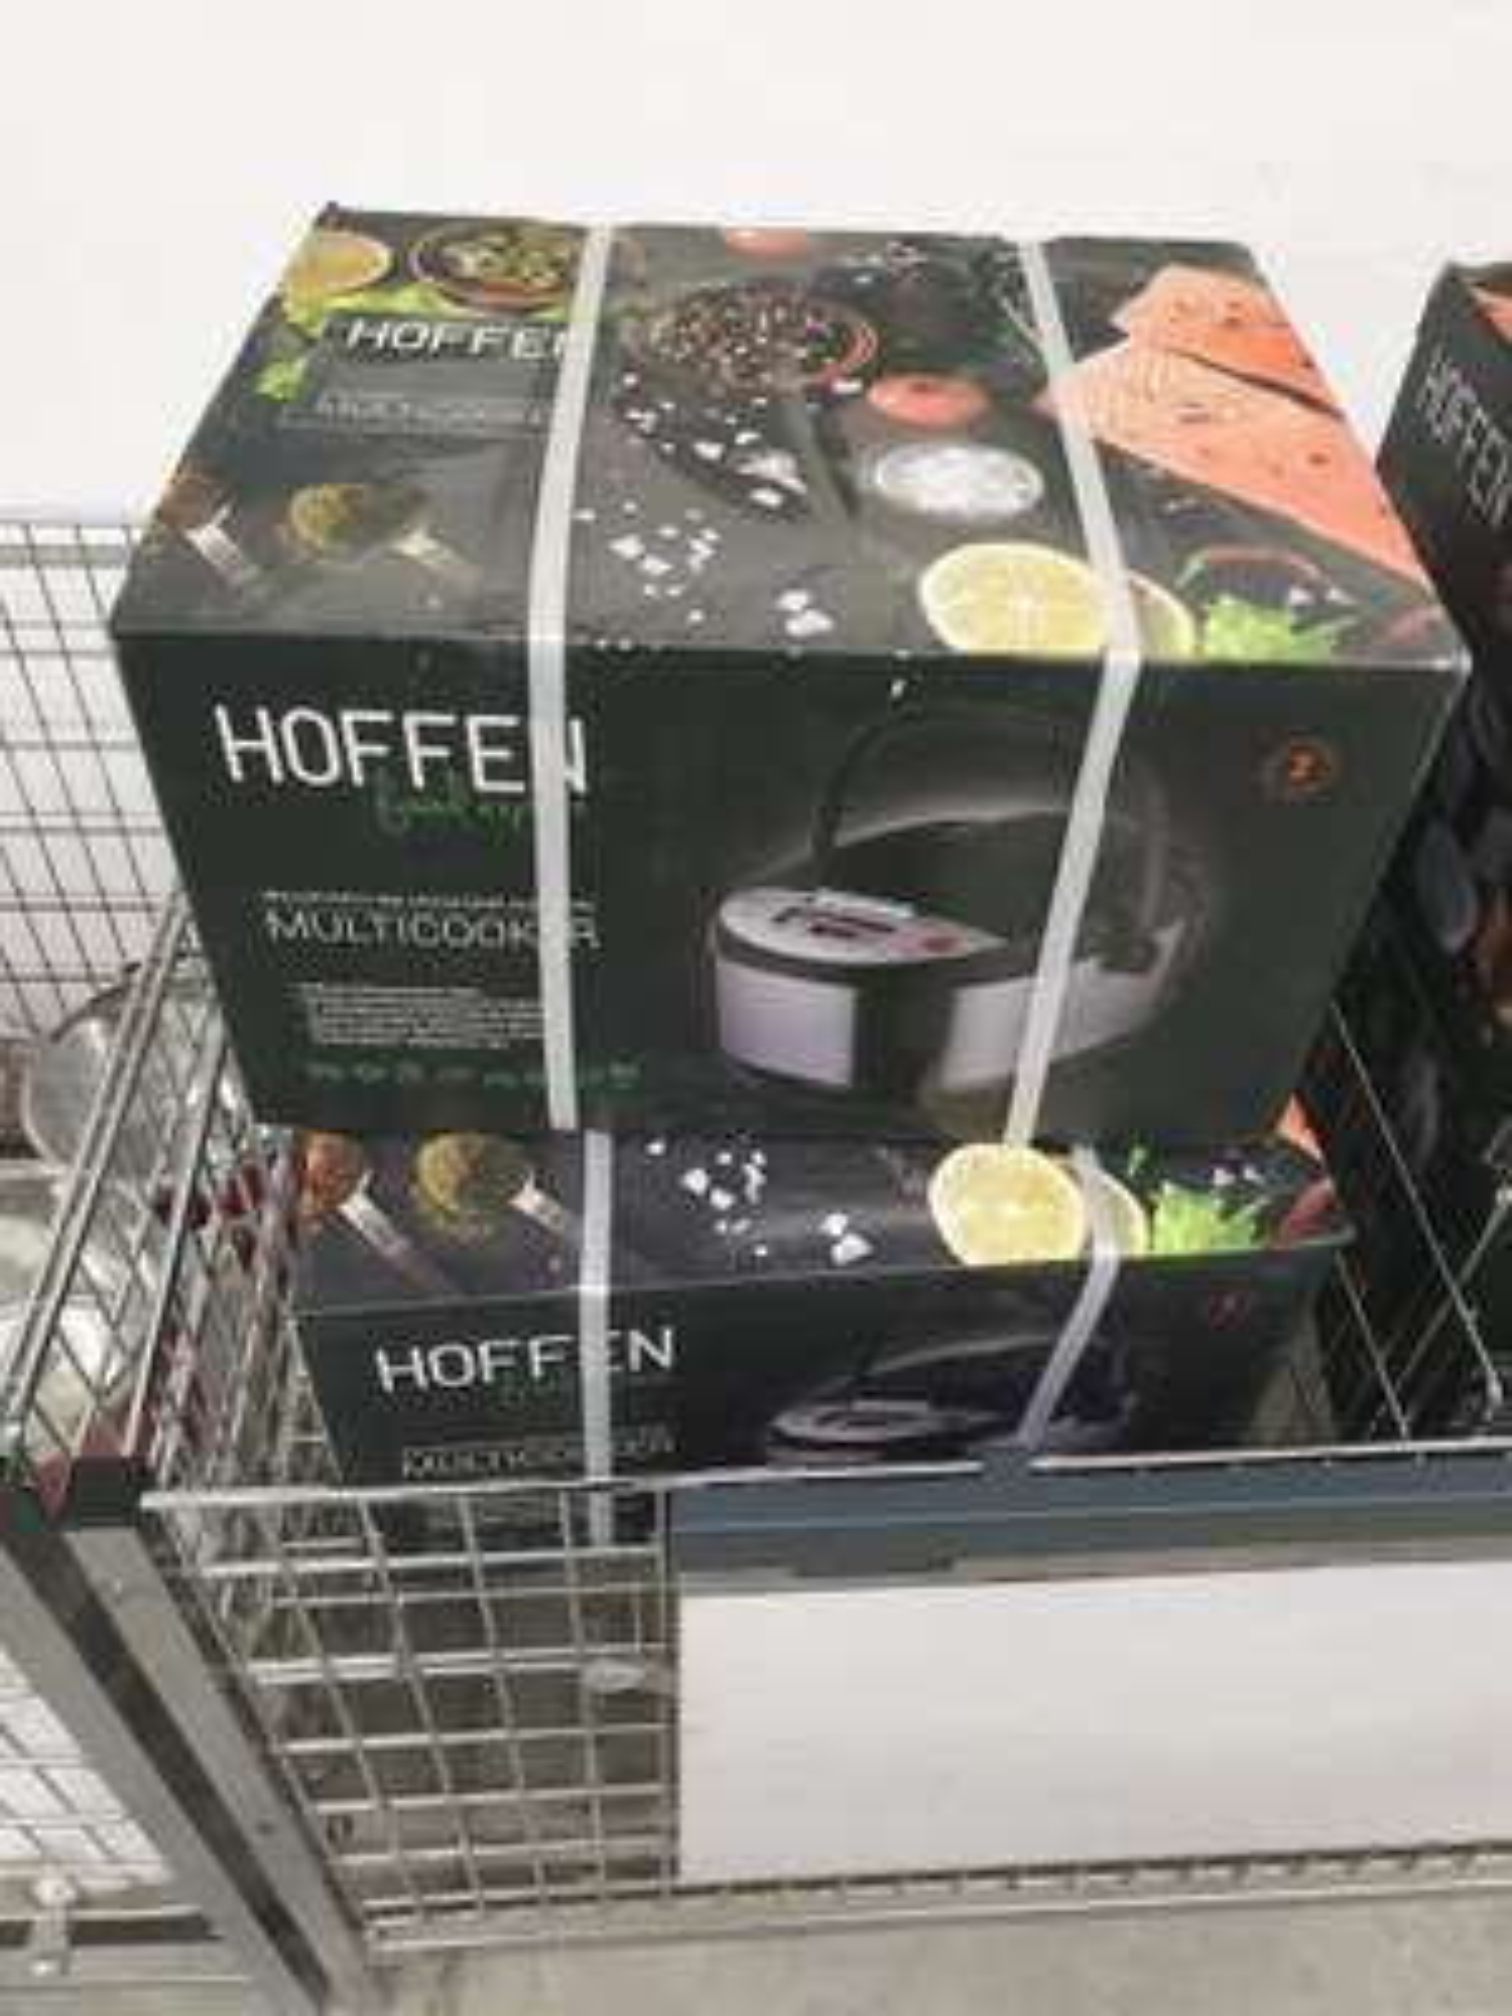 Hoffen Multicooker Outlet Biedronka Poznań